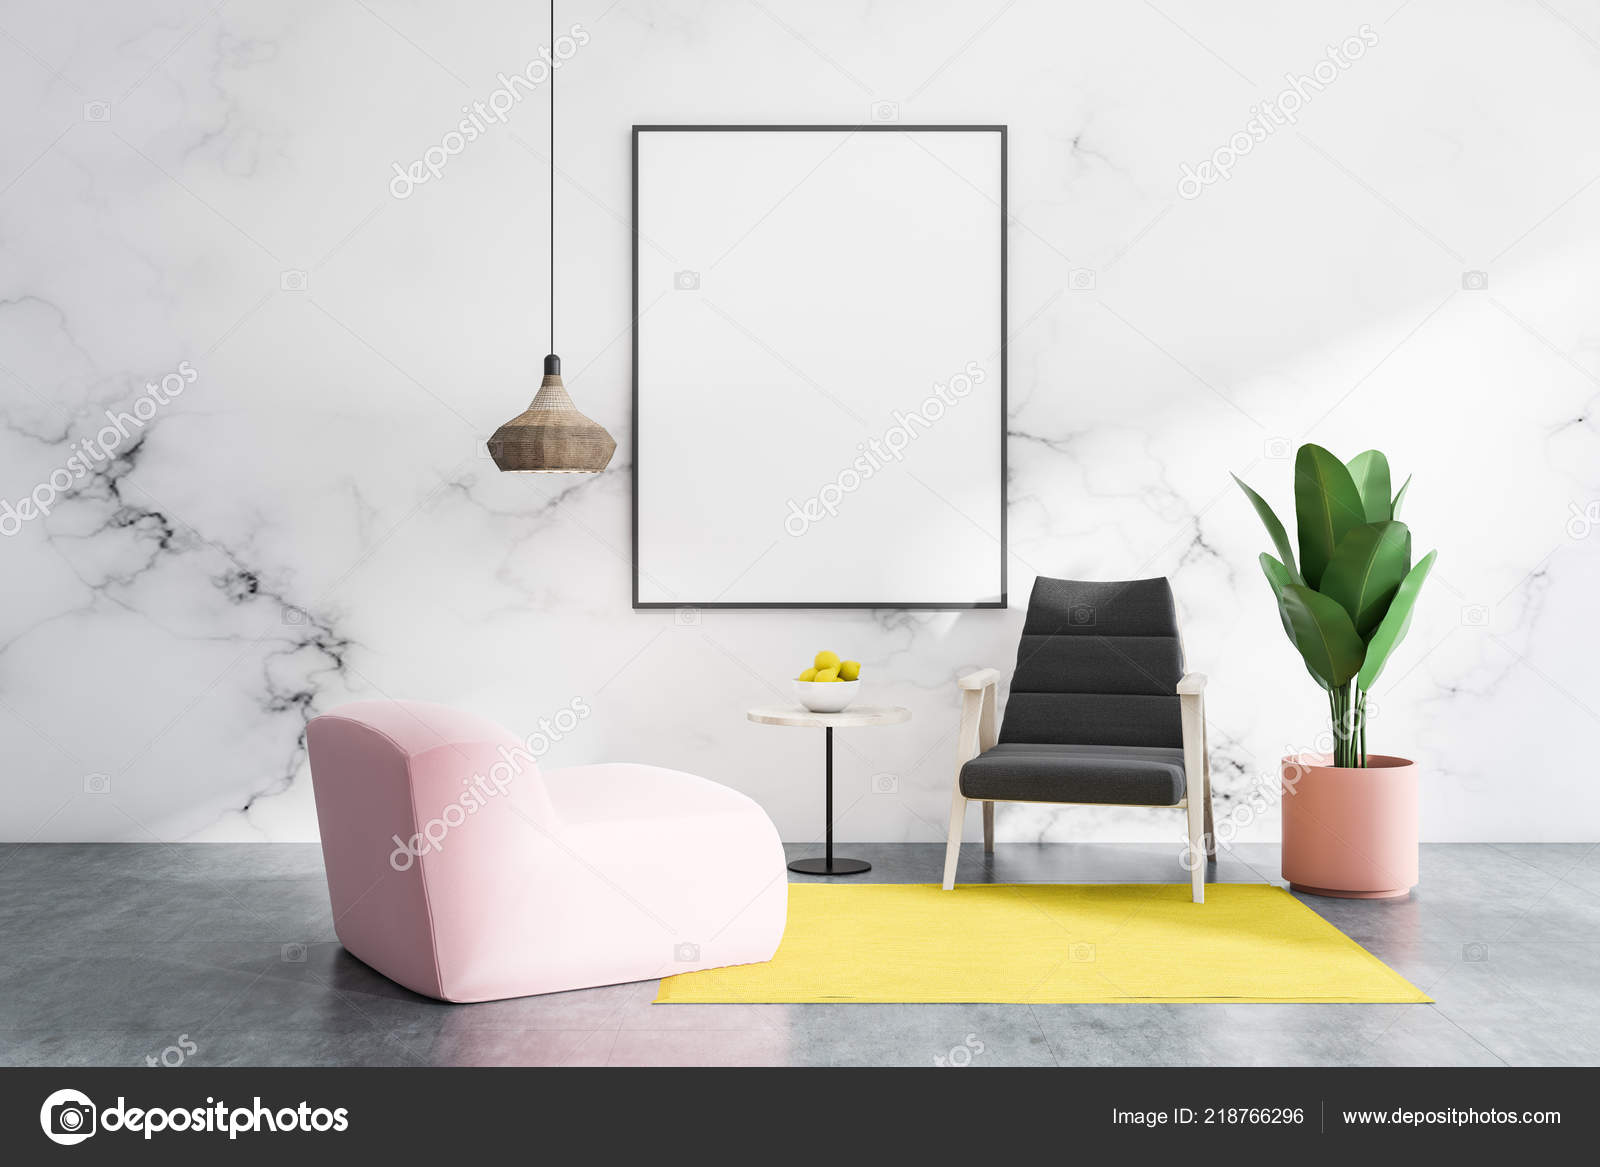 White Marble Living Room Interior Concrete Floor Black Pink Armchairs Stock Photo C Denisismagilov 218766296